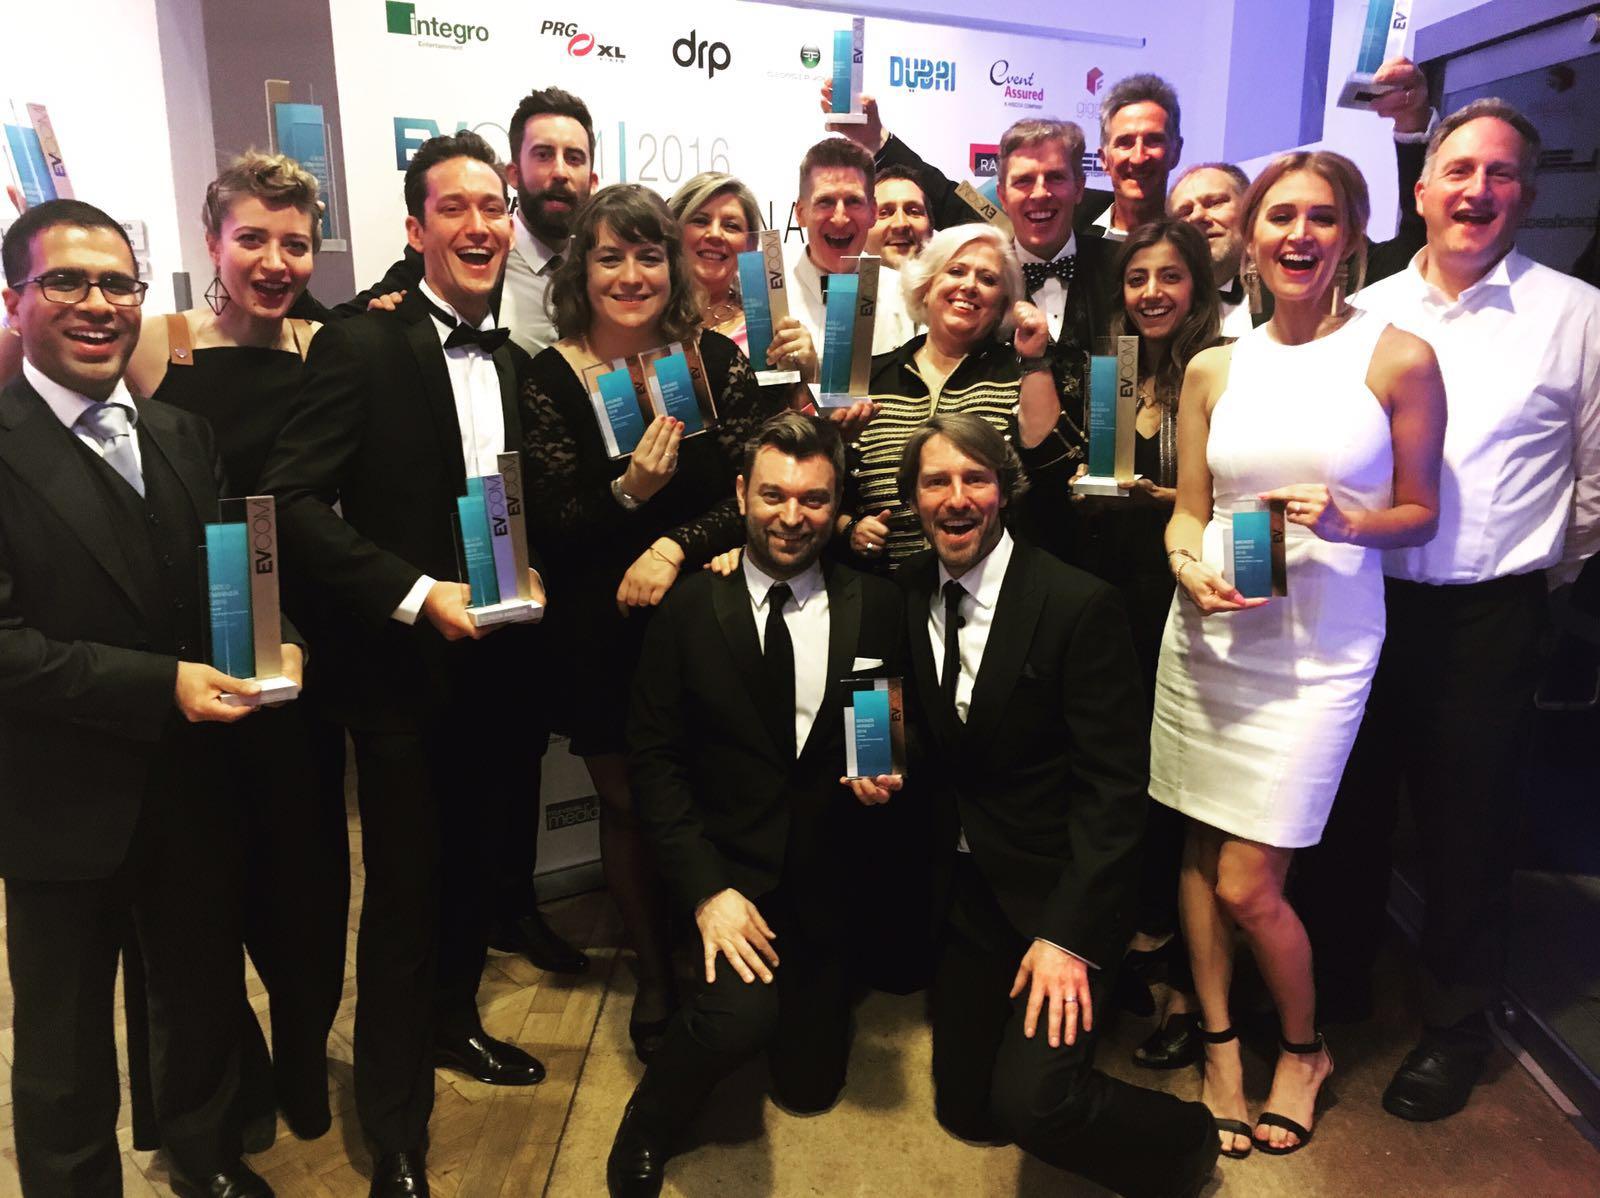 Award photo at the EVCOM Screen Awards 2016